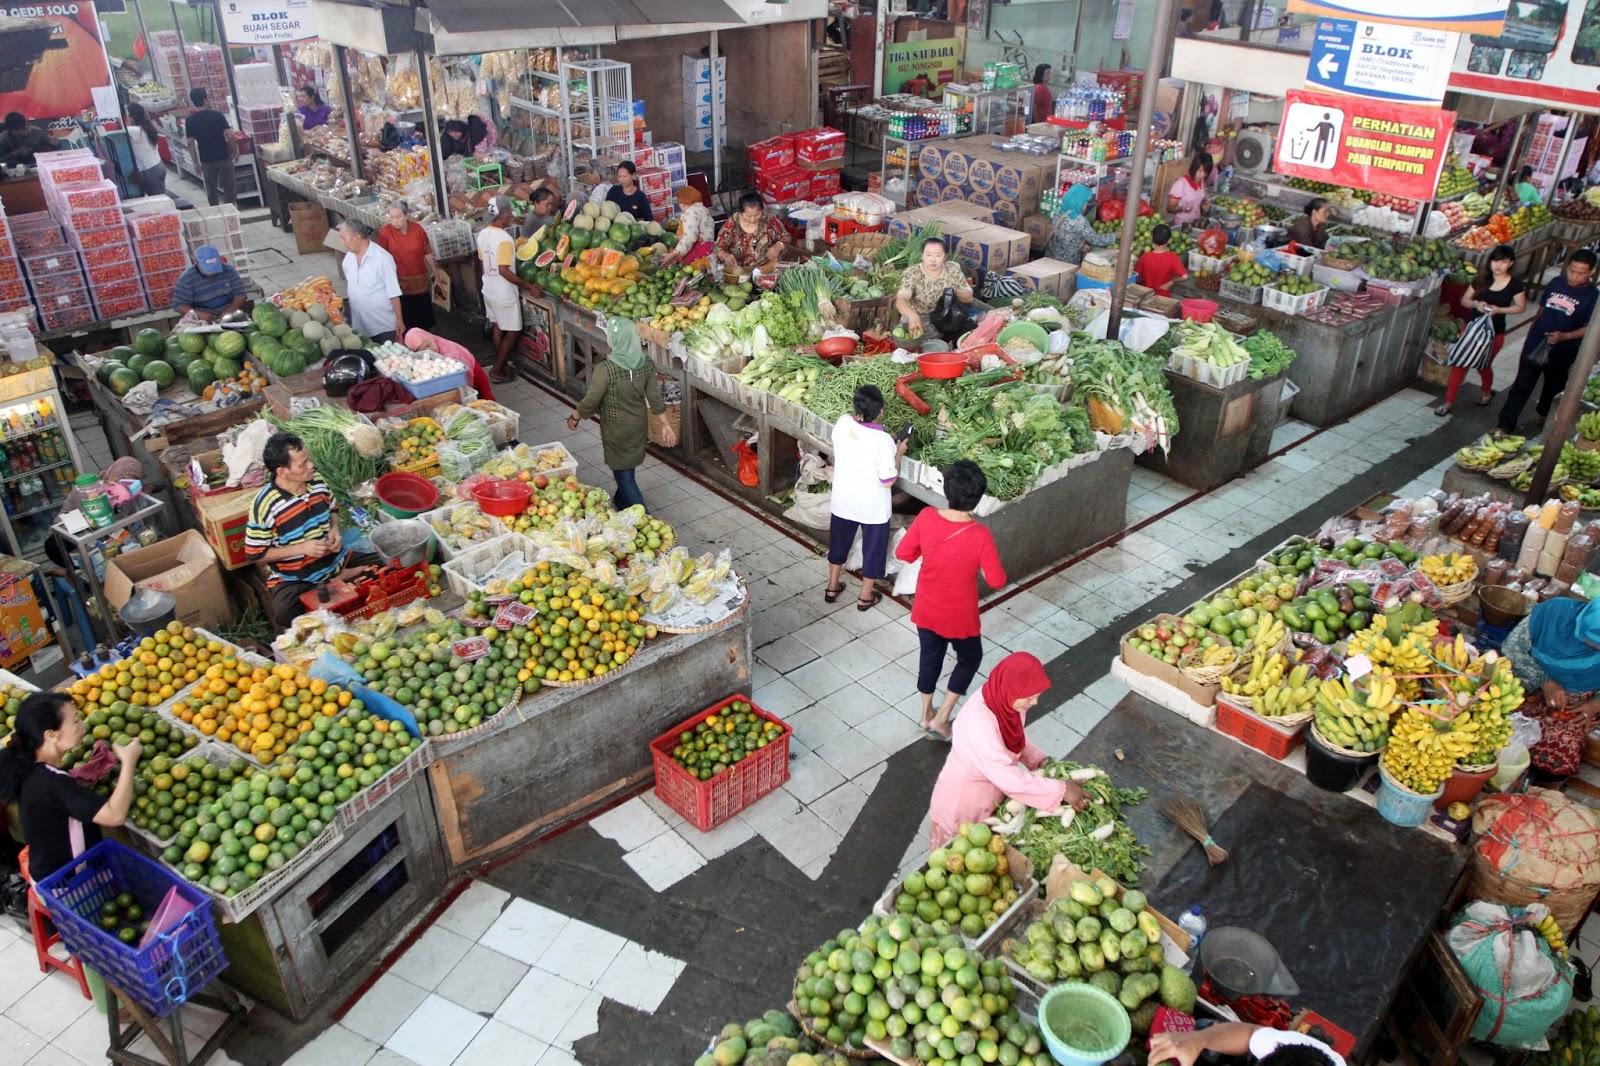 https: img-k.okeinfo.net content 2018 12 08 320 1988601 bagaimana-harga-pangan-jelang-natal-dan-tahun-baru-RoMUZDOaDy.jpg